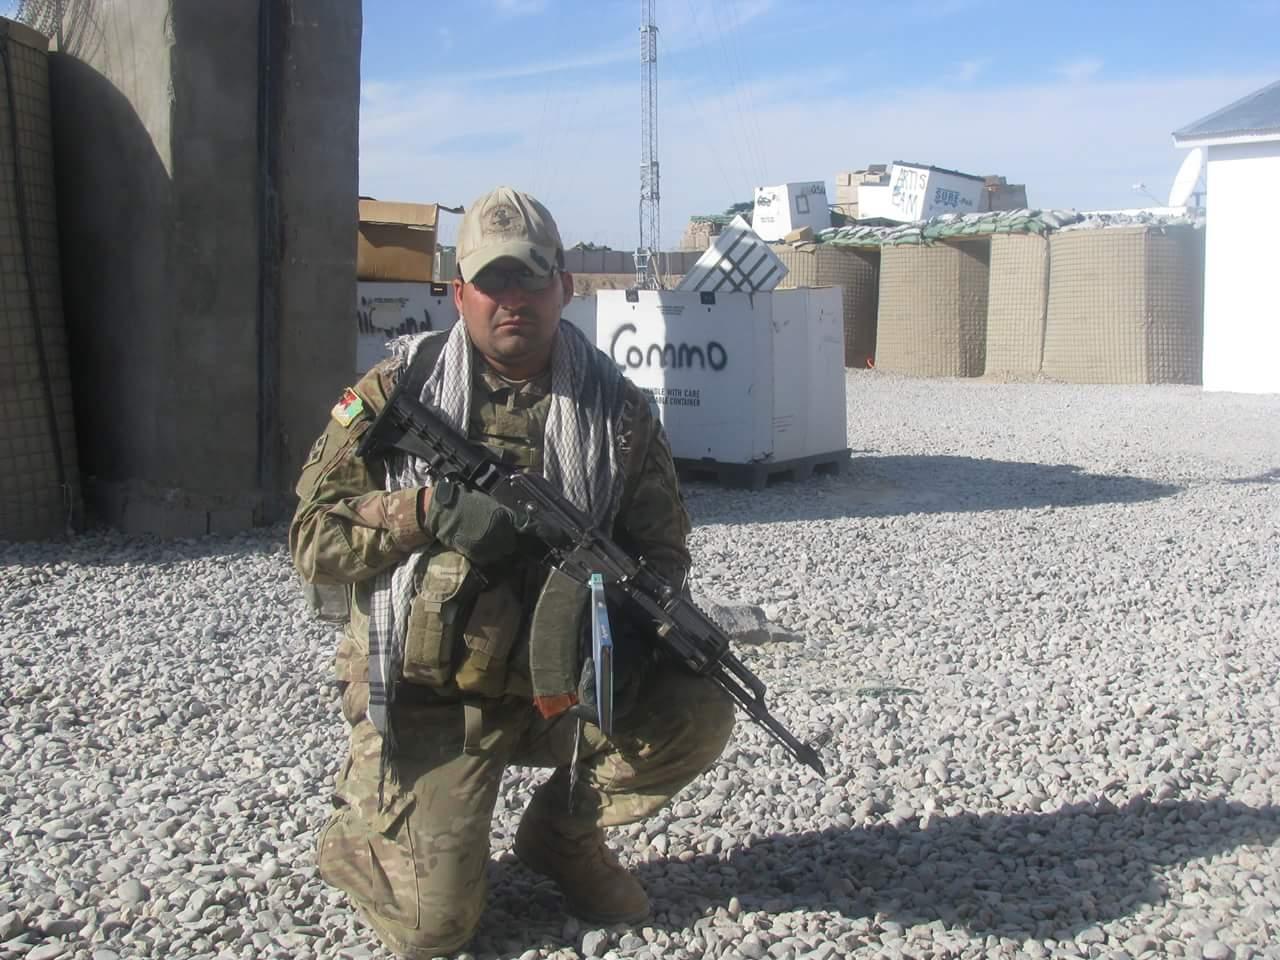 Archi in his US Army uniform